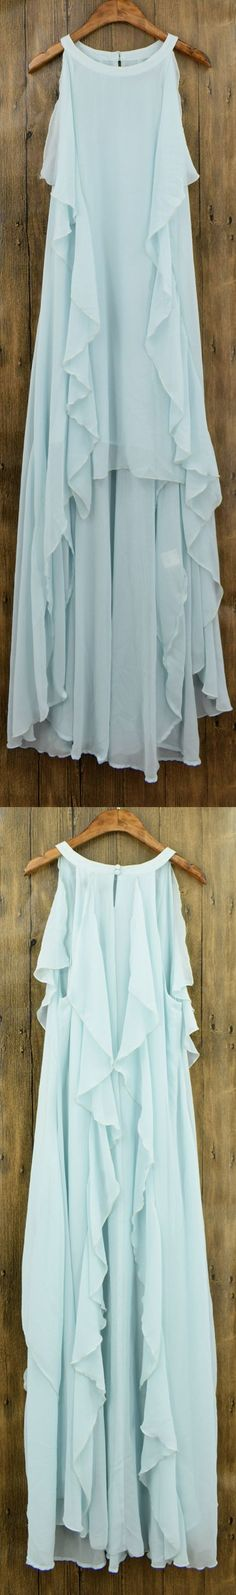 Women's Flounce Decor Sleeveless Asymmetric Chiffon Dress